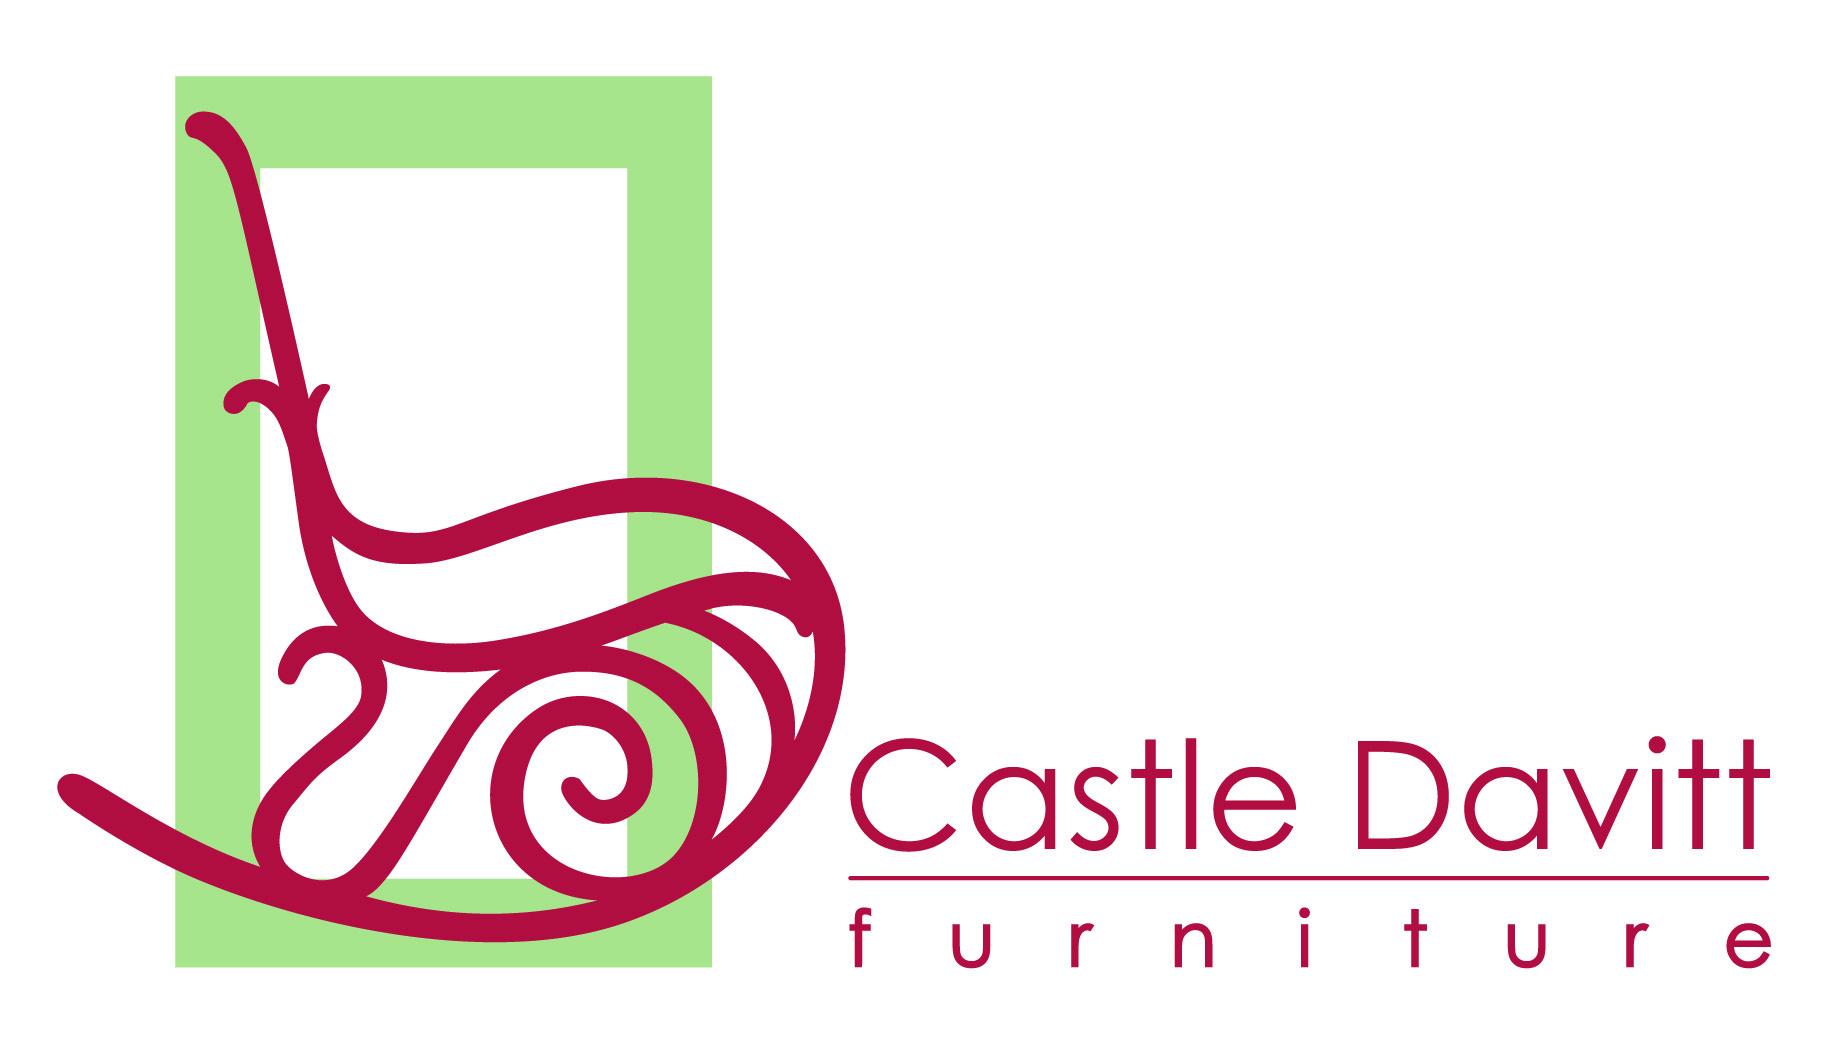 Castle Davitt Furniture Logo